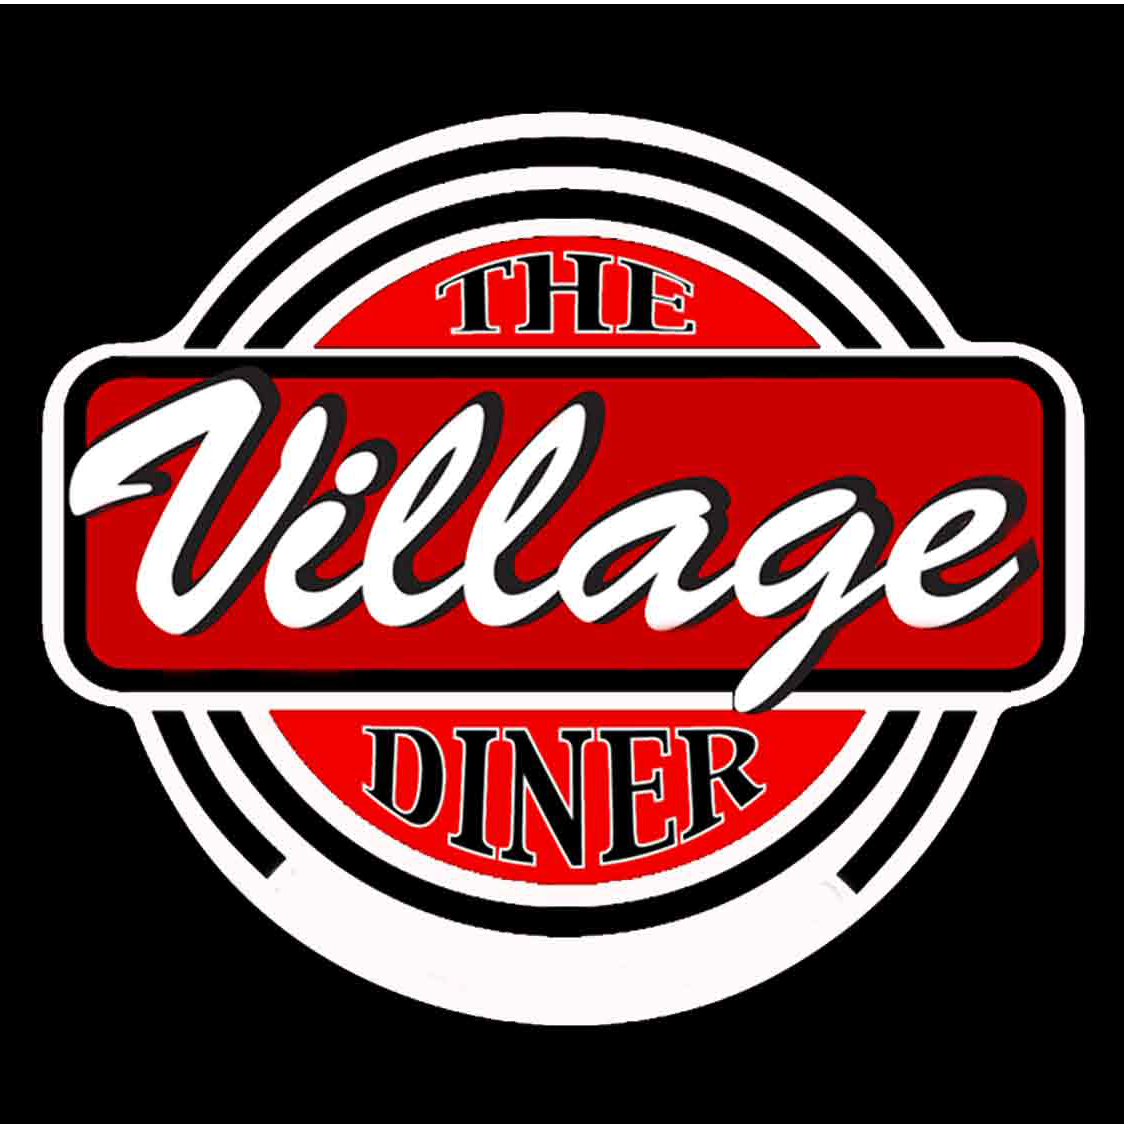 The Village Diner - Johnson City, NY 13790 - (607)217-4134 | ShowMeLocal.com